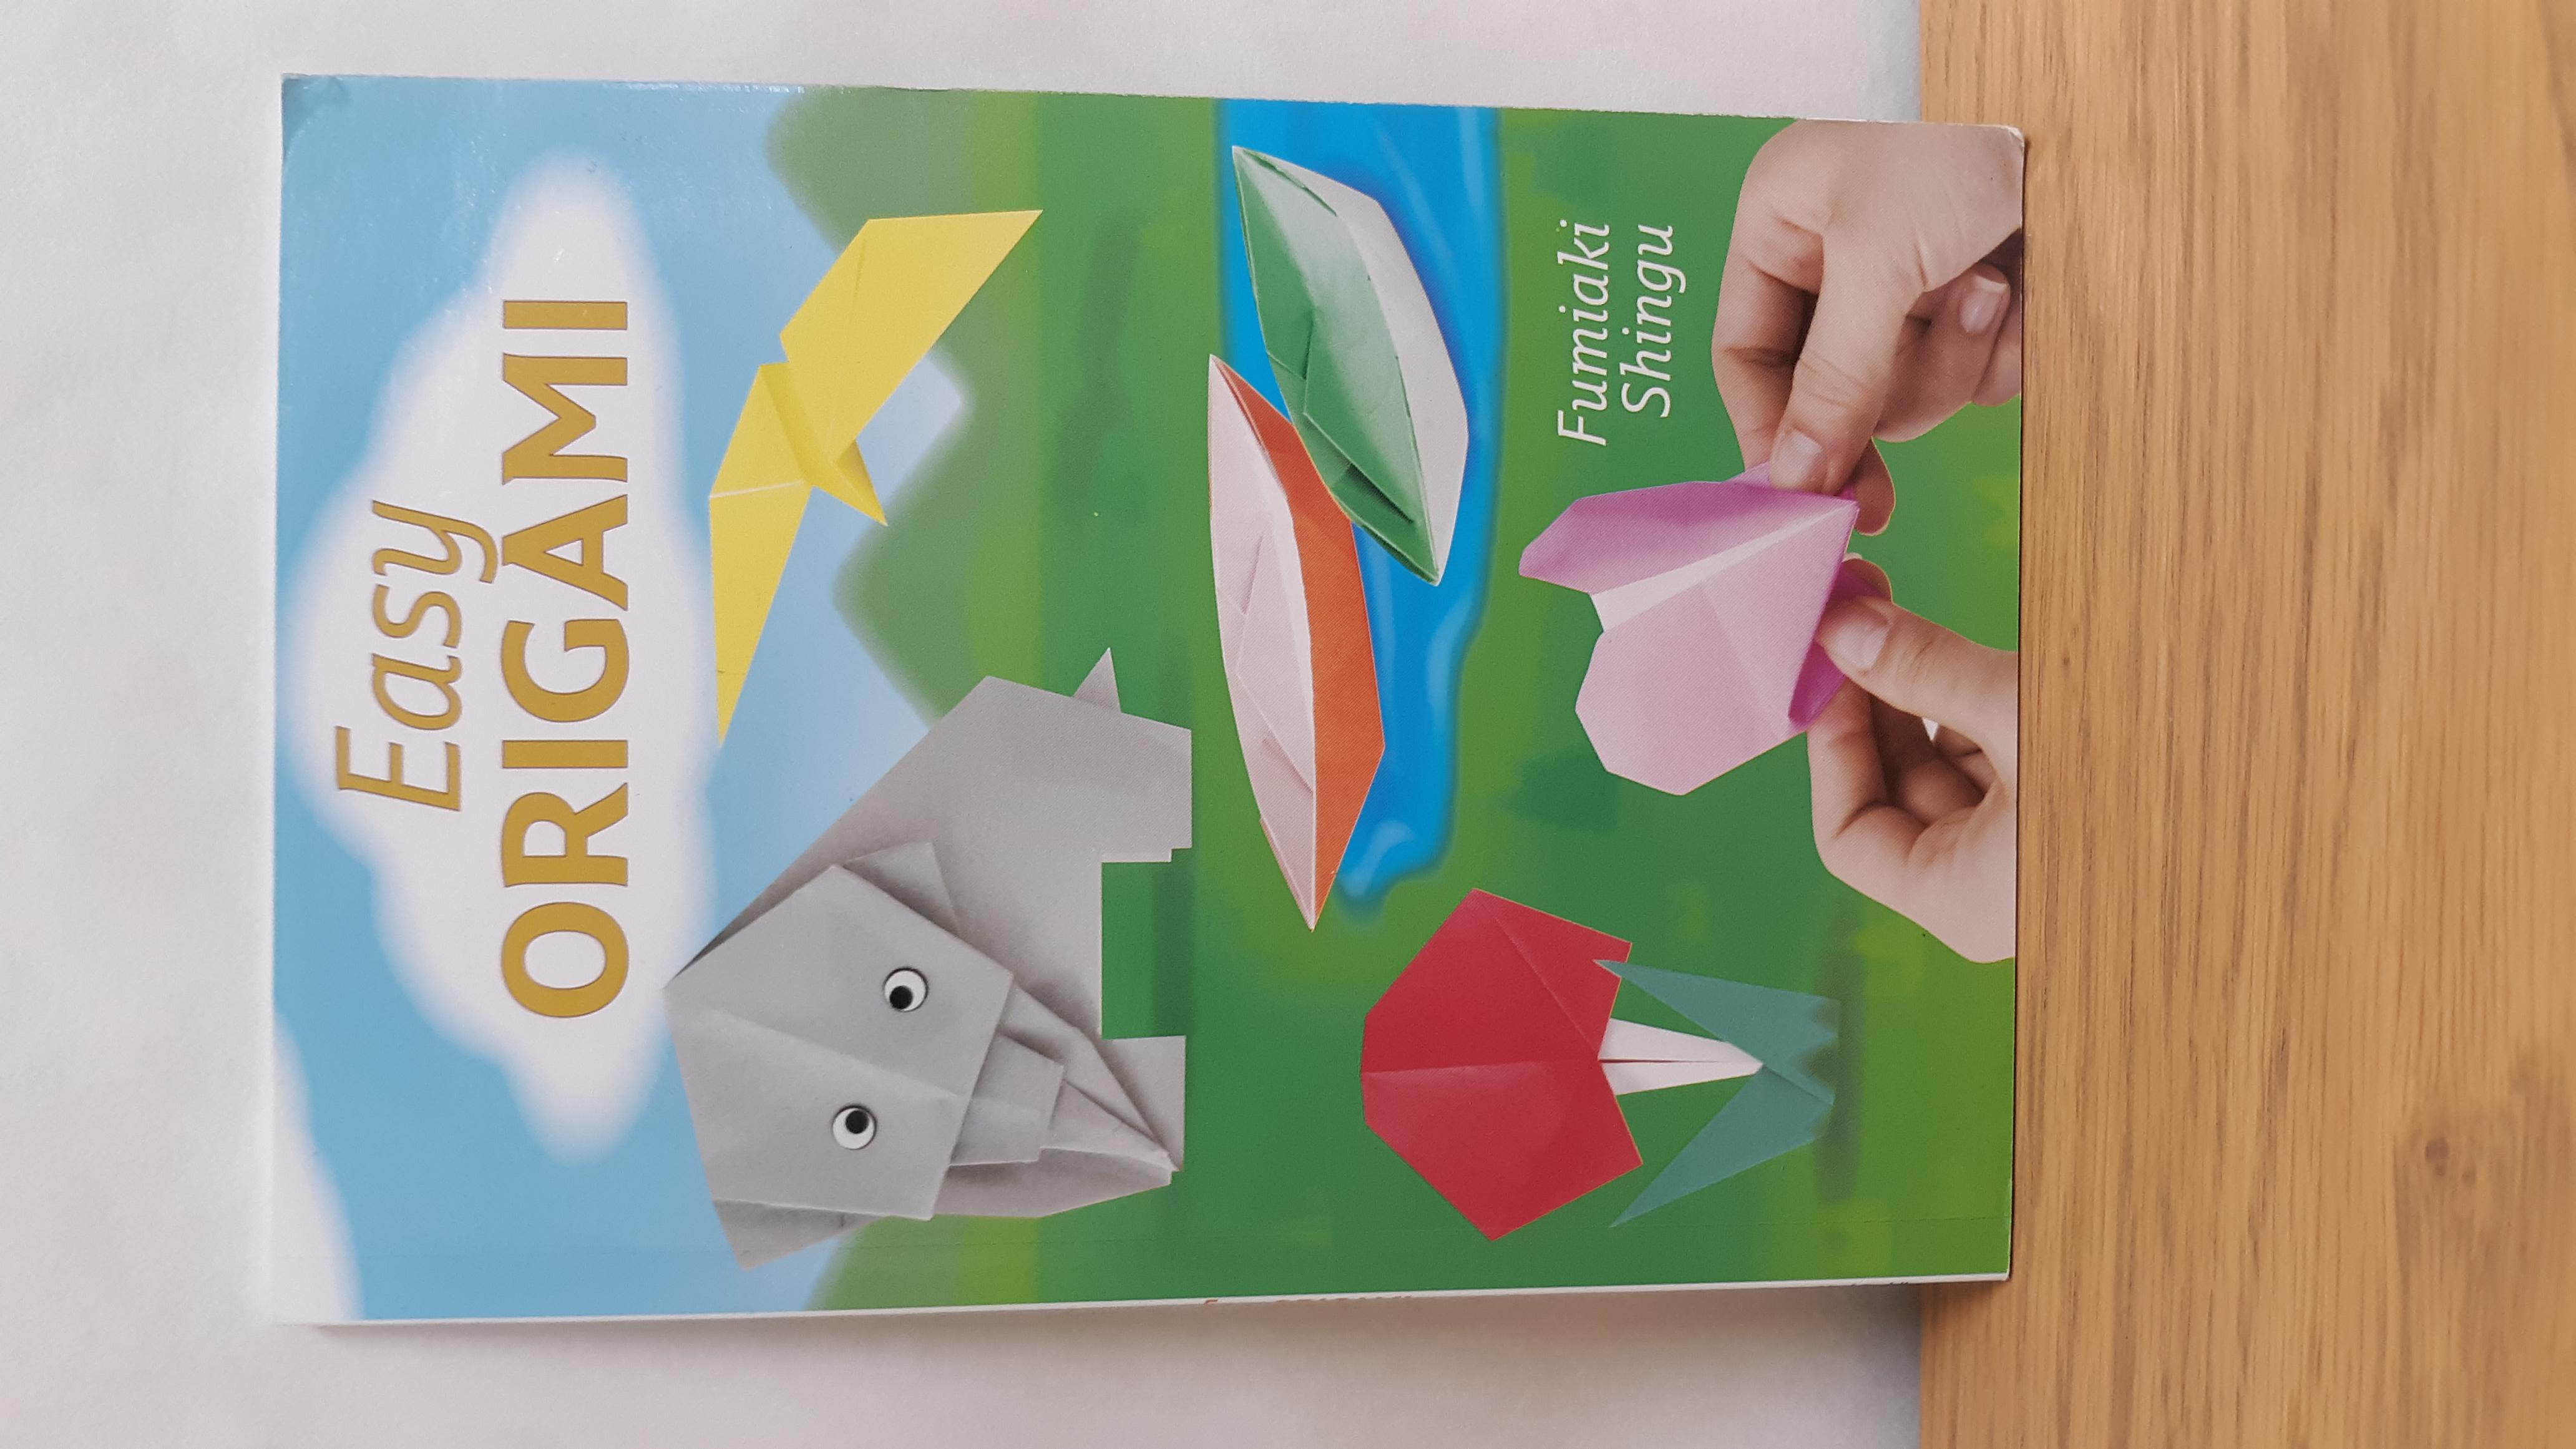 https://0201.nccdn.net/1_2/000/000/11a/dfb/easy-origami.jpg